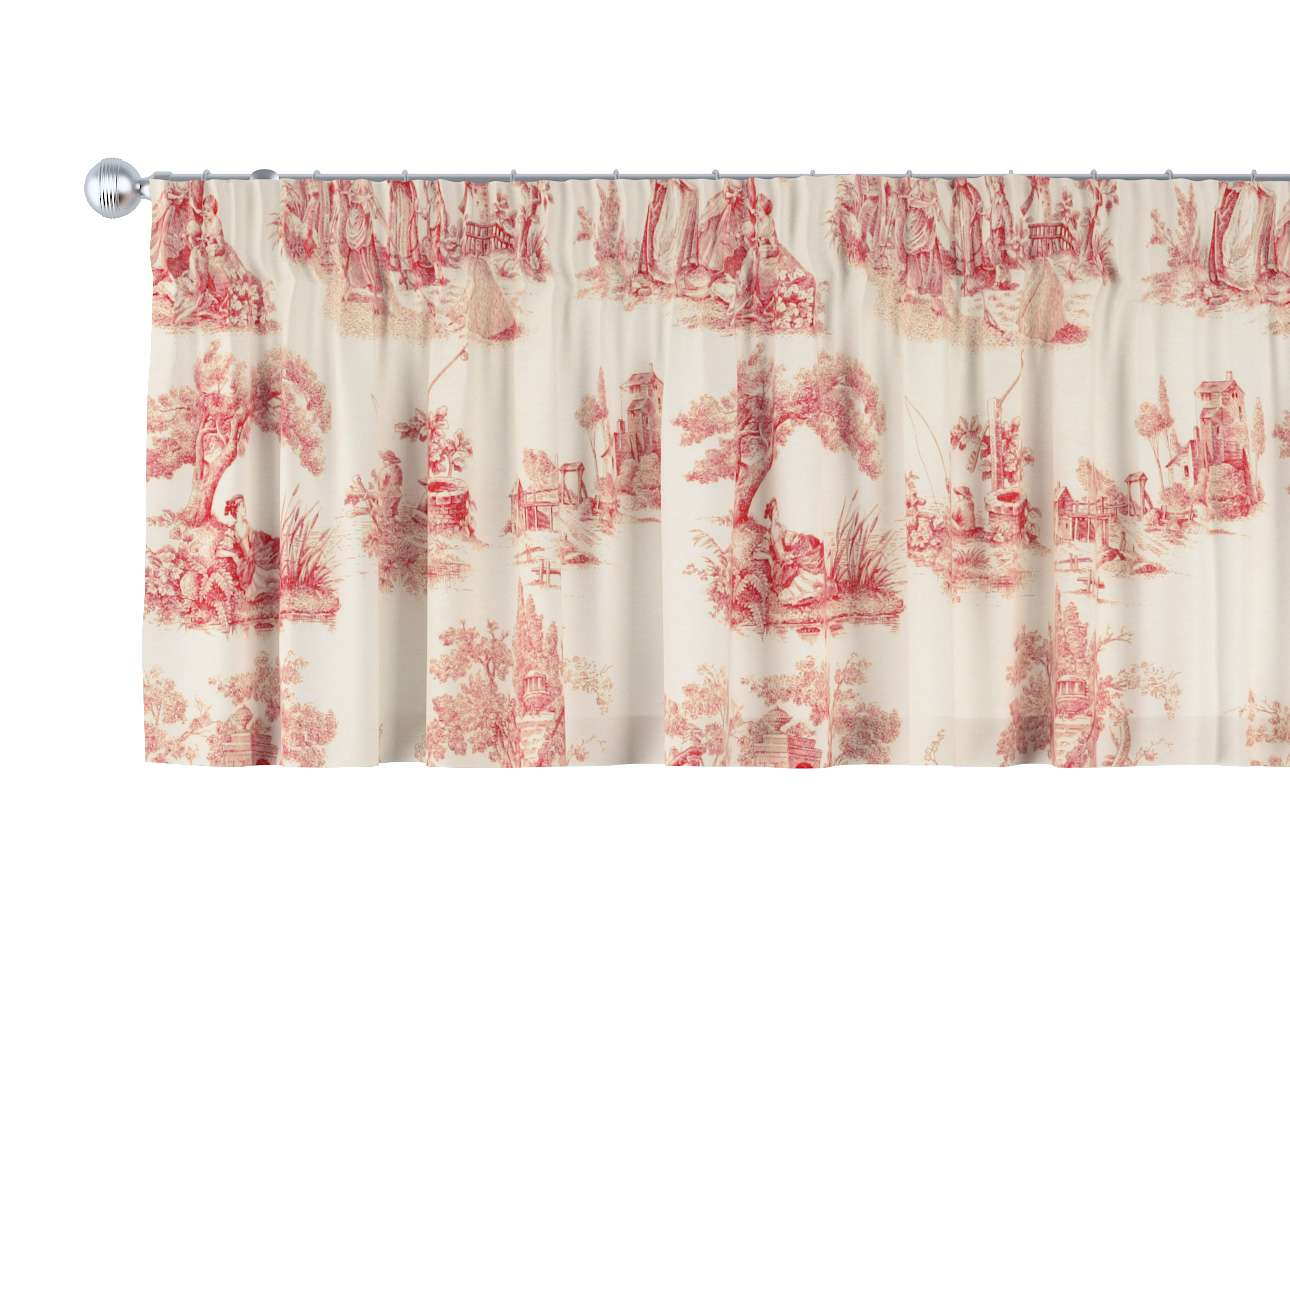 Pencil pleat pelmet in collection Avinon, fabric: 132-15